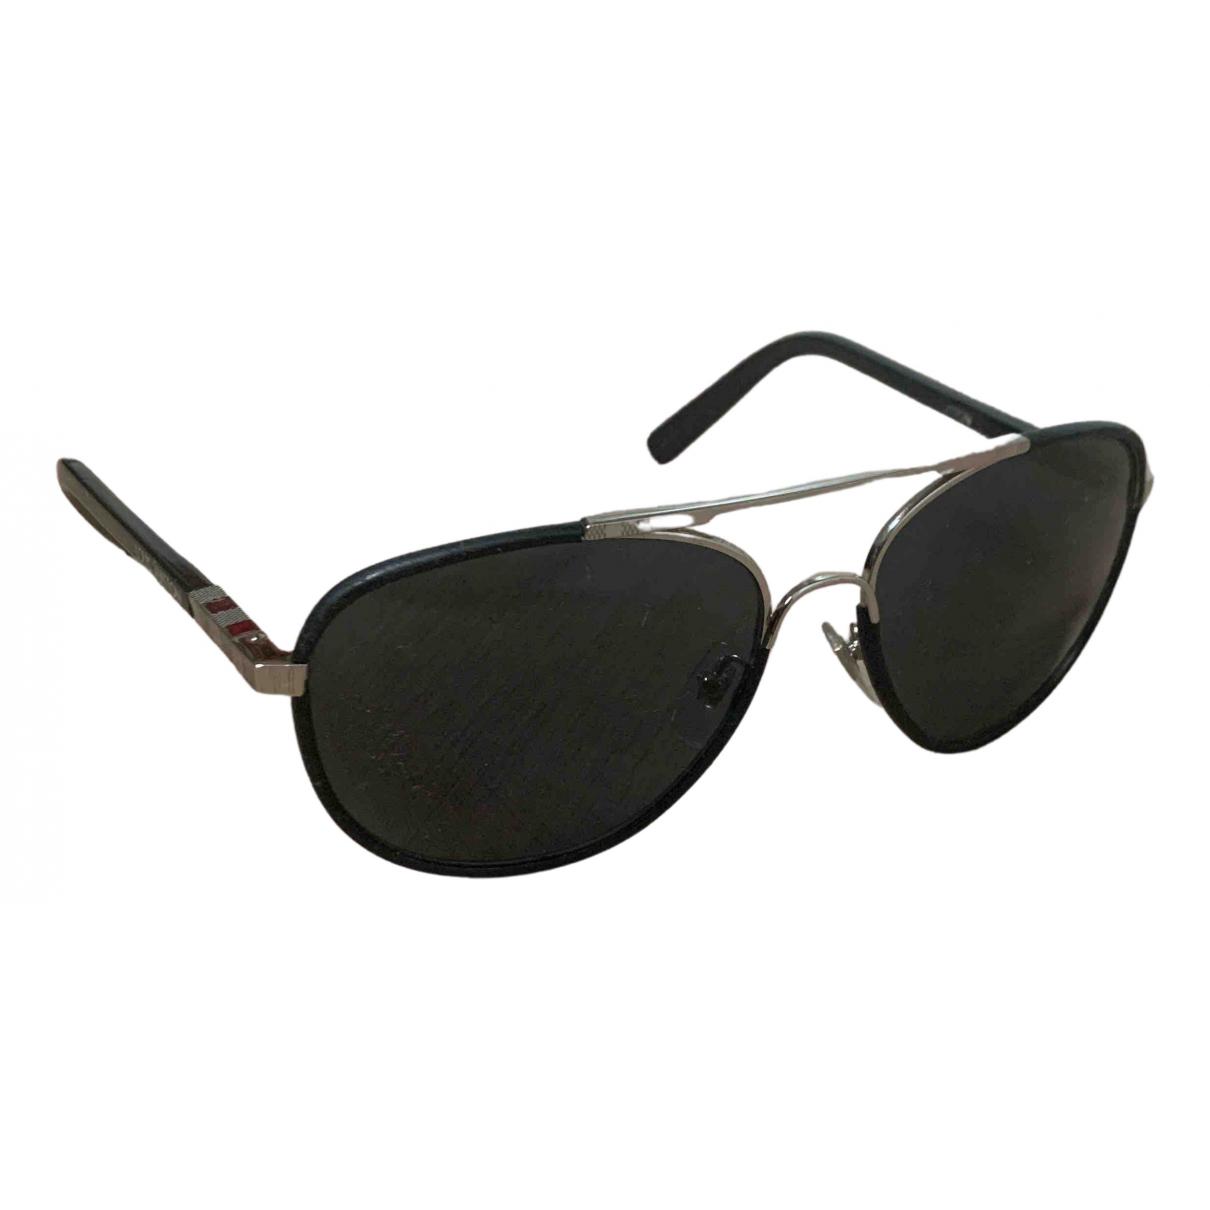 Louis Vuitton Charleston Black Metal Sunglasses for Men N